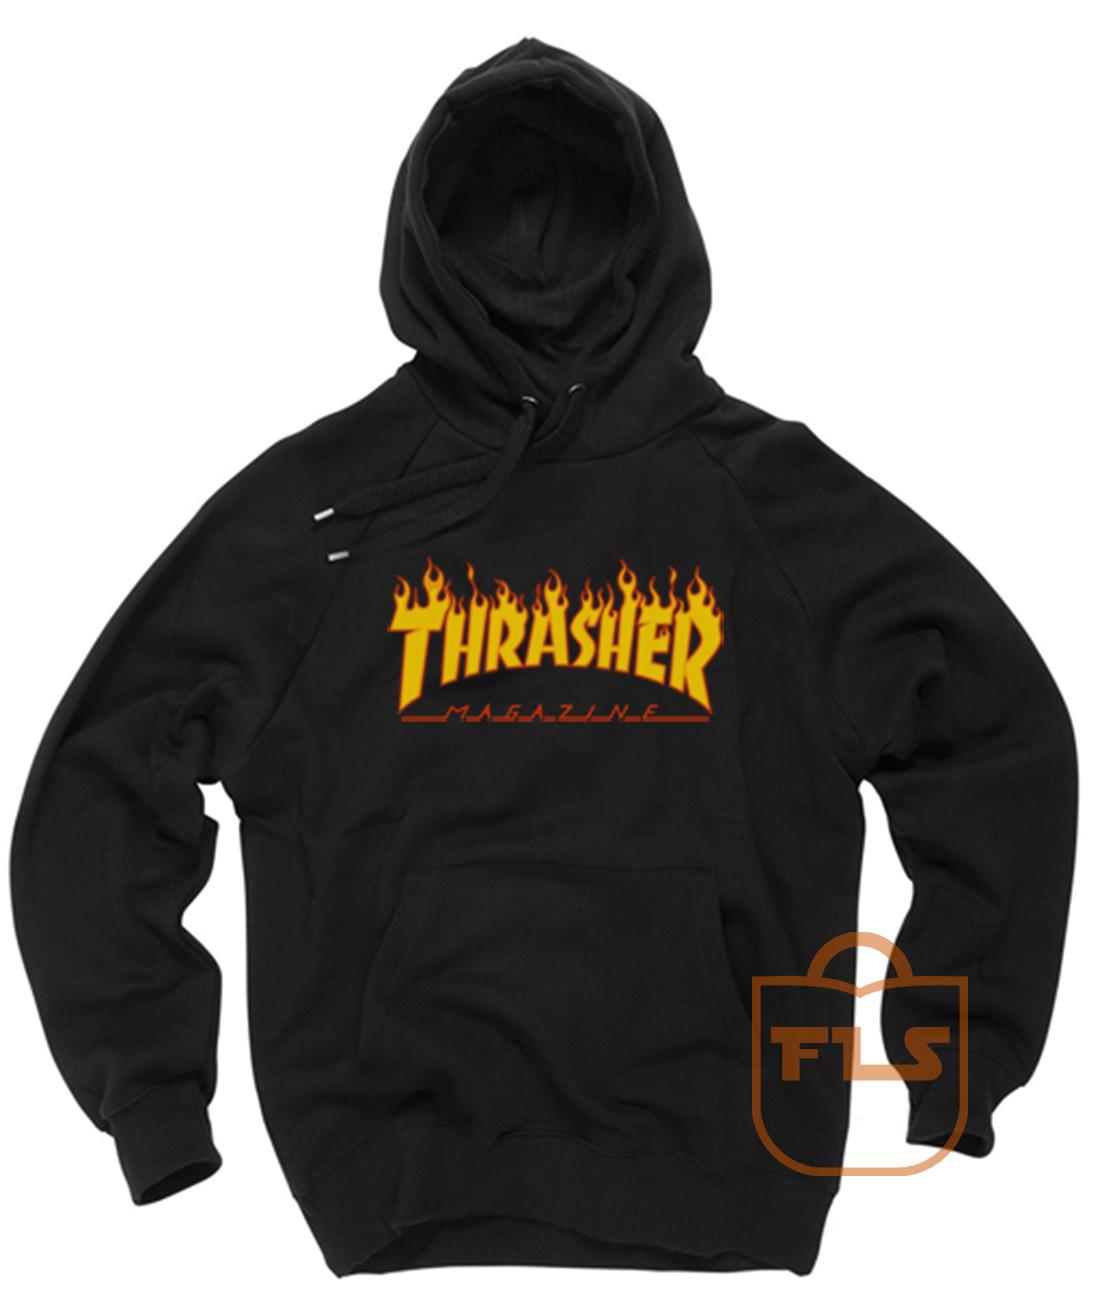 9aff1288780f Thrasher Magazine Fire Unisex Pullover Hoodies - Ferolos.com